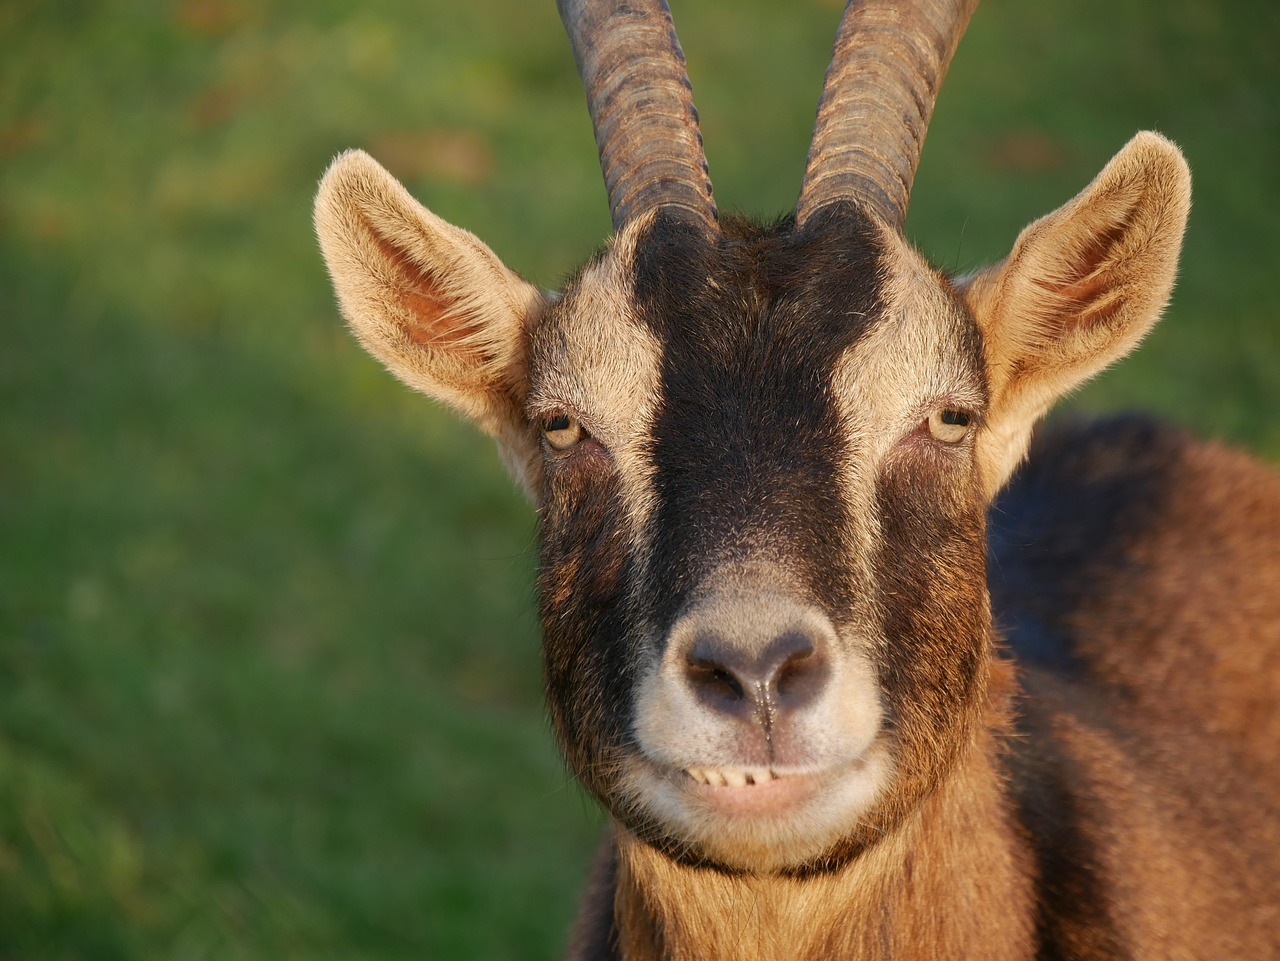 goat - photo #13